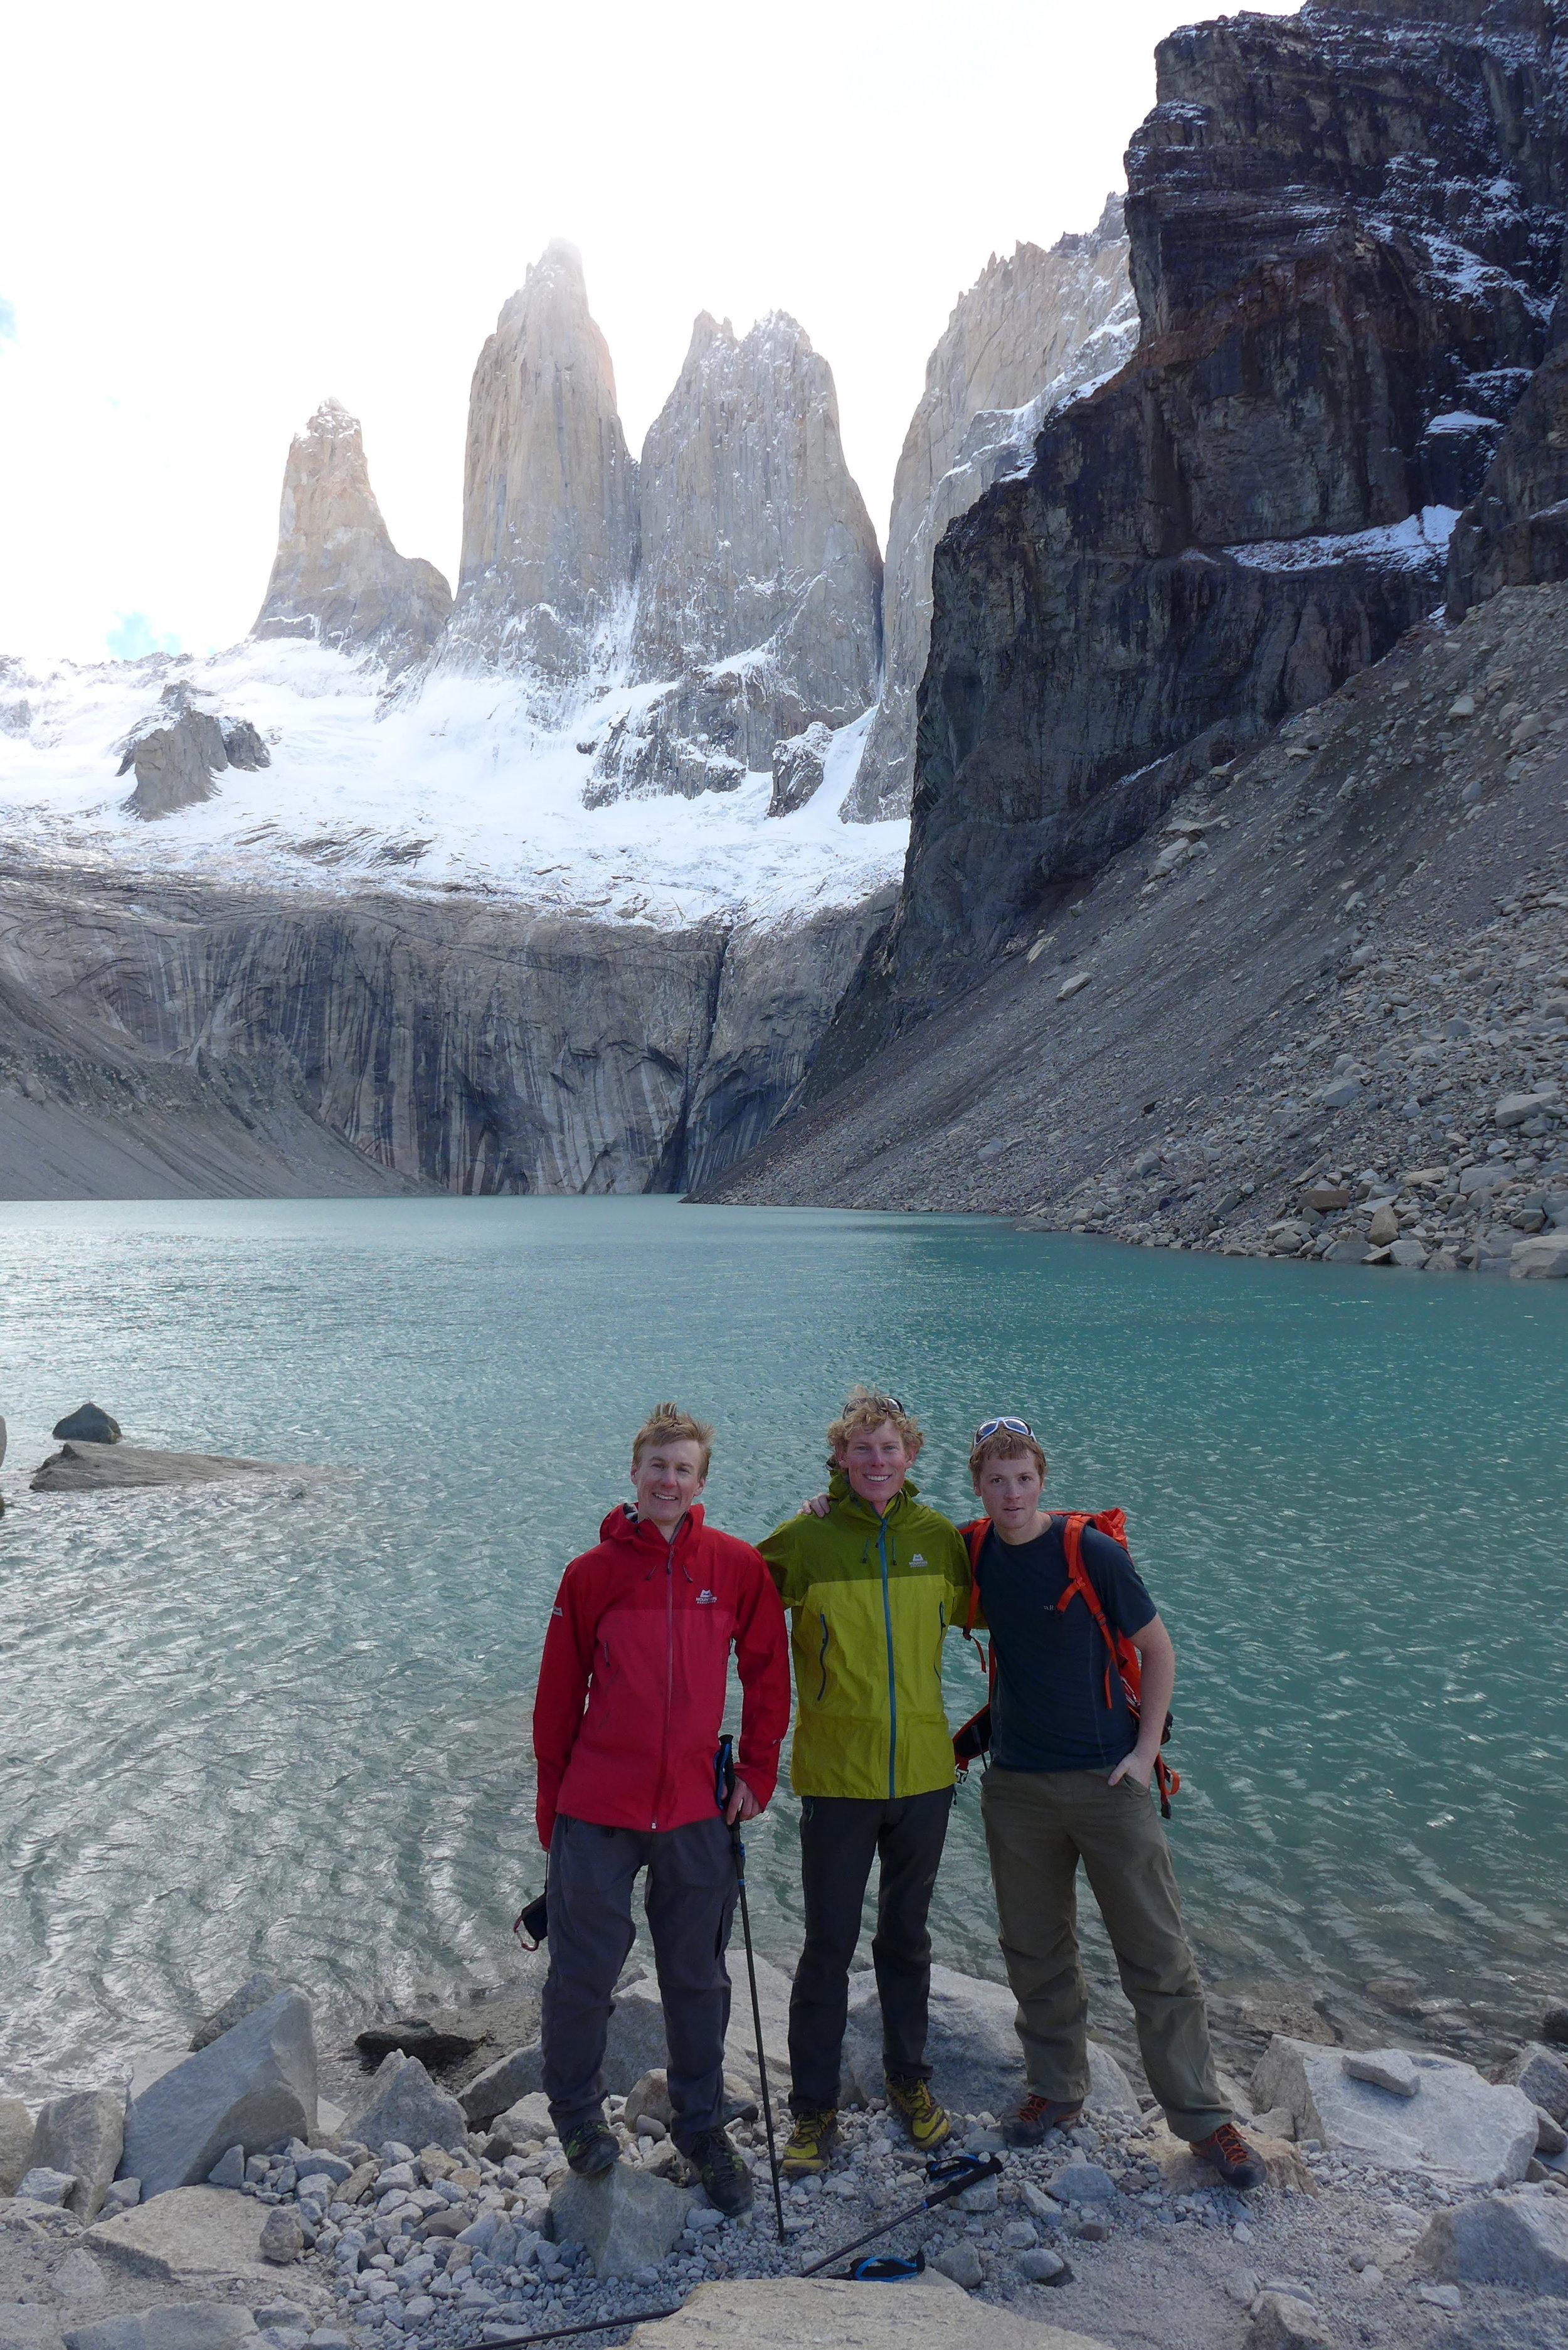 Tony, me and Calum beneath the three Torres del Paine. Photo: Calum Muskett